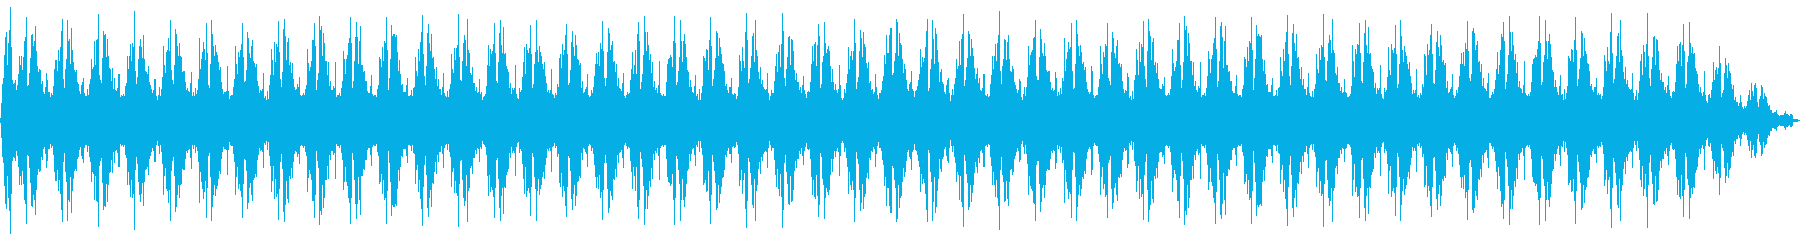 魔法詠唱、魔法発動、独白 01の再生済みの波形